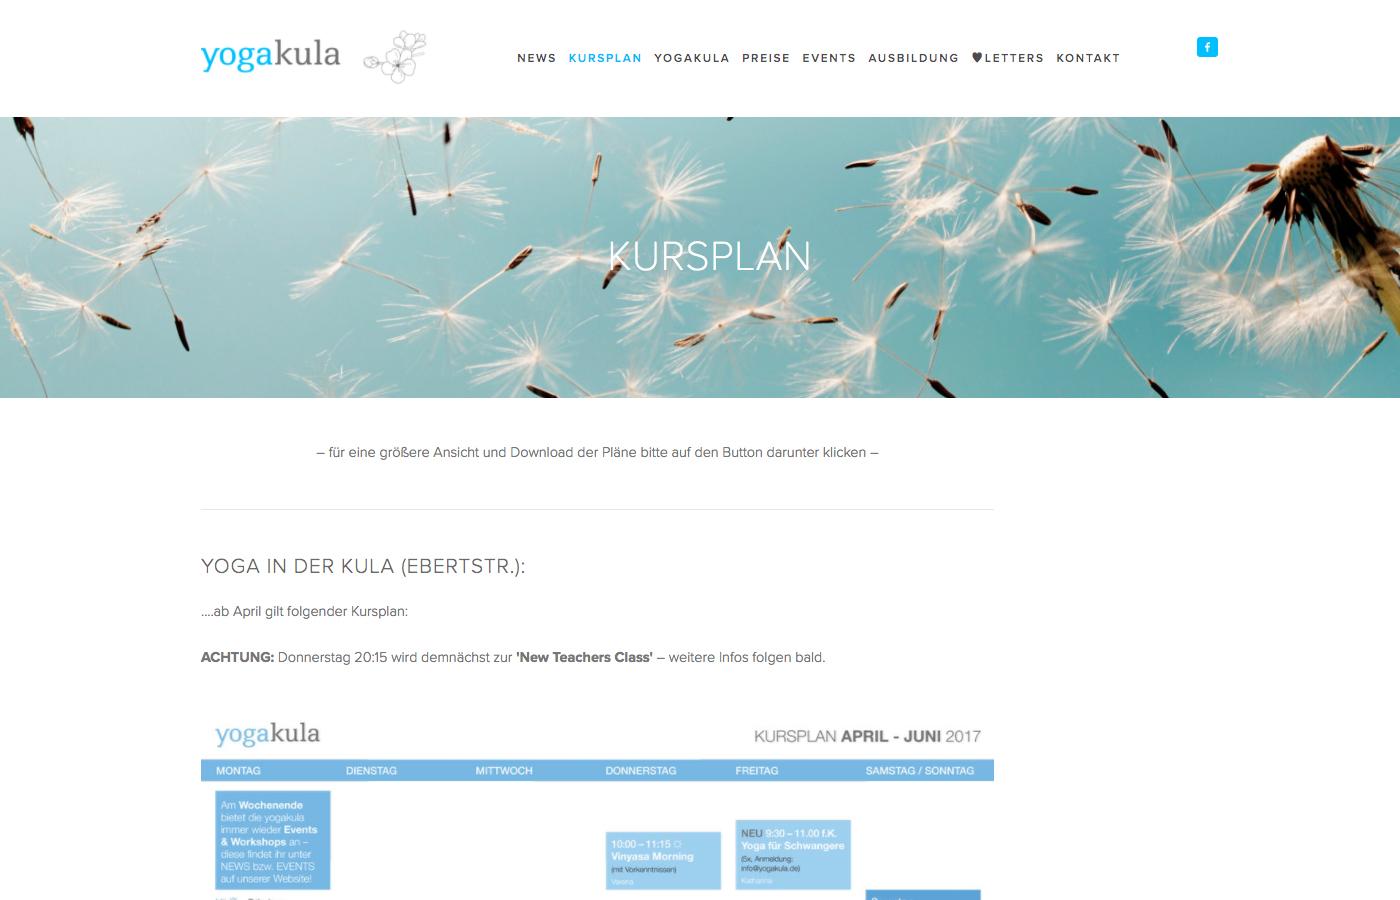 kula_website_1400x900_scr_0000_Ebene 8.jpg